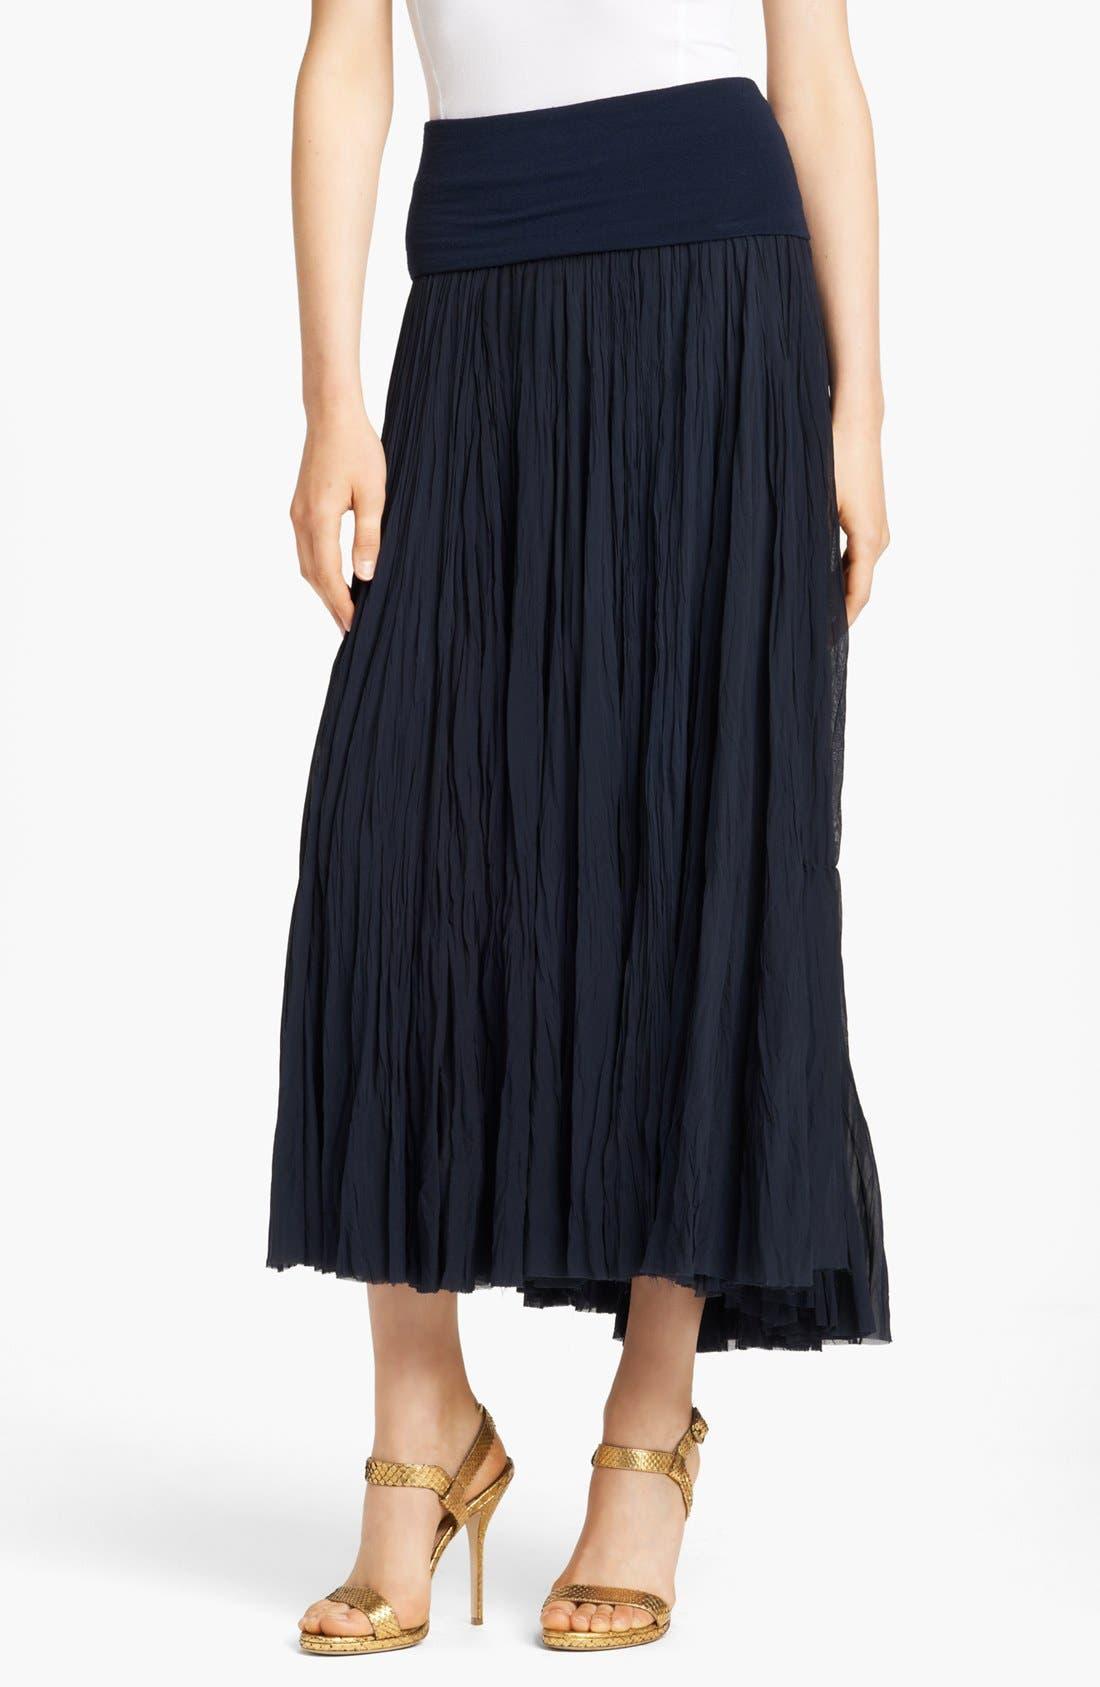 Alternate Image 1 Selected - Donna Karan Casual Luxe Silk Georgette Midi Skirt